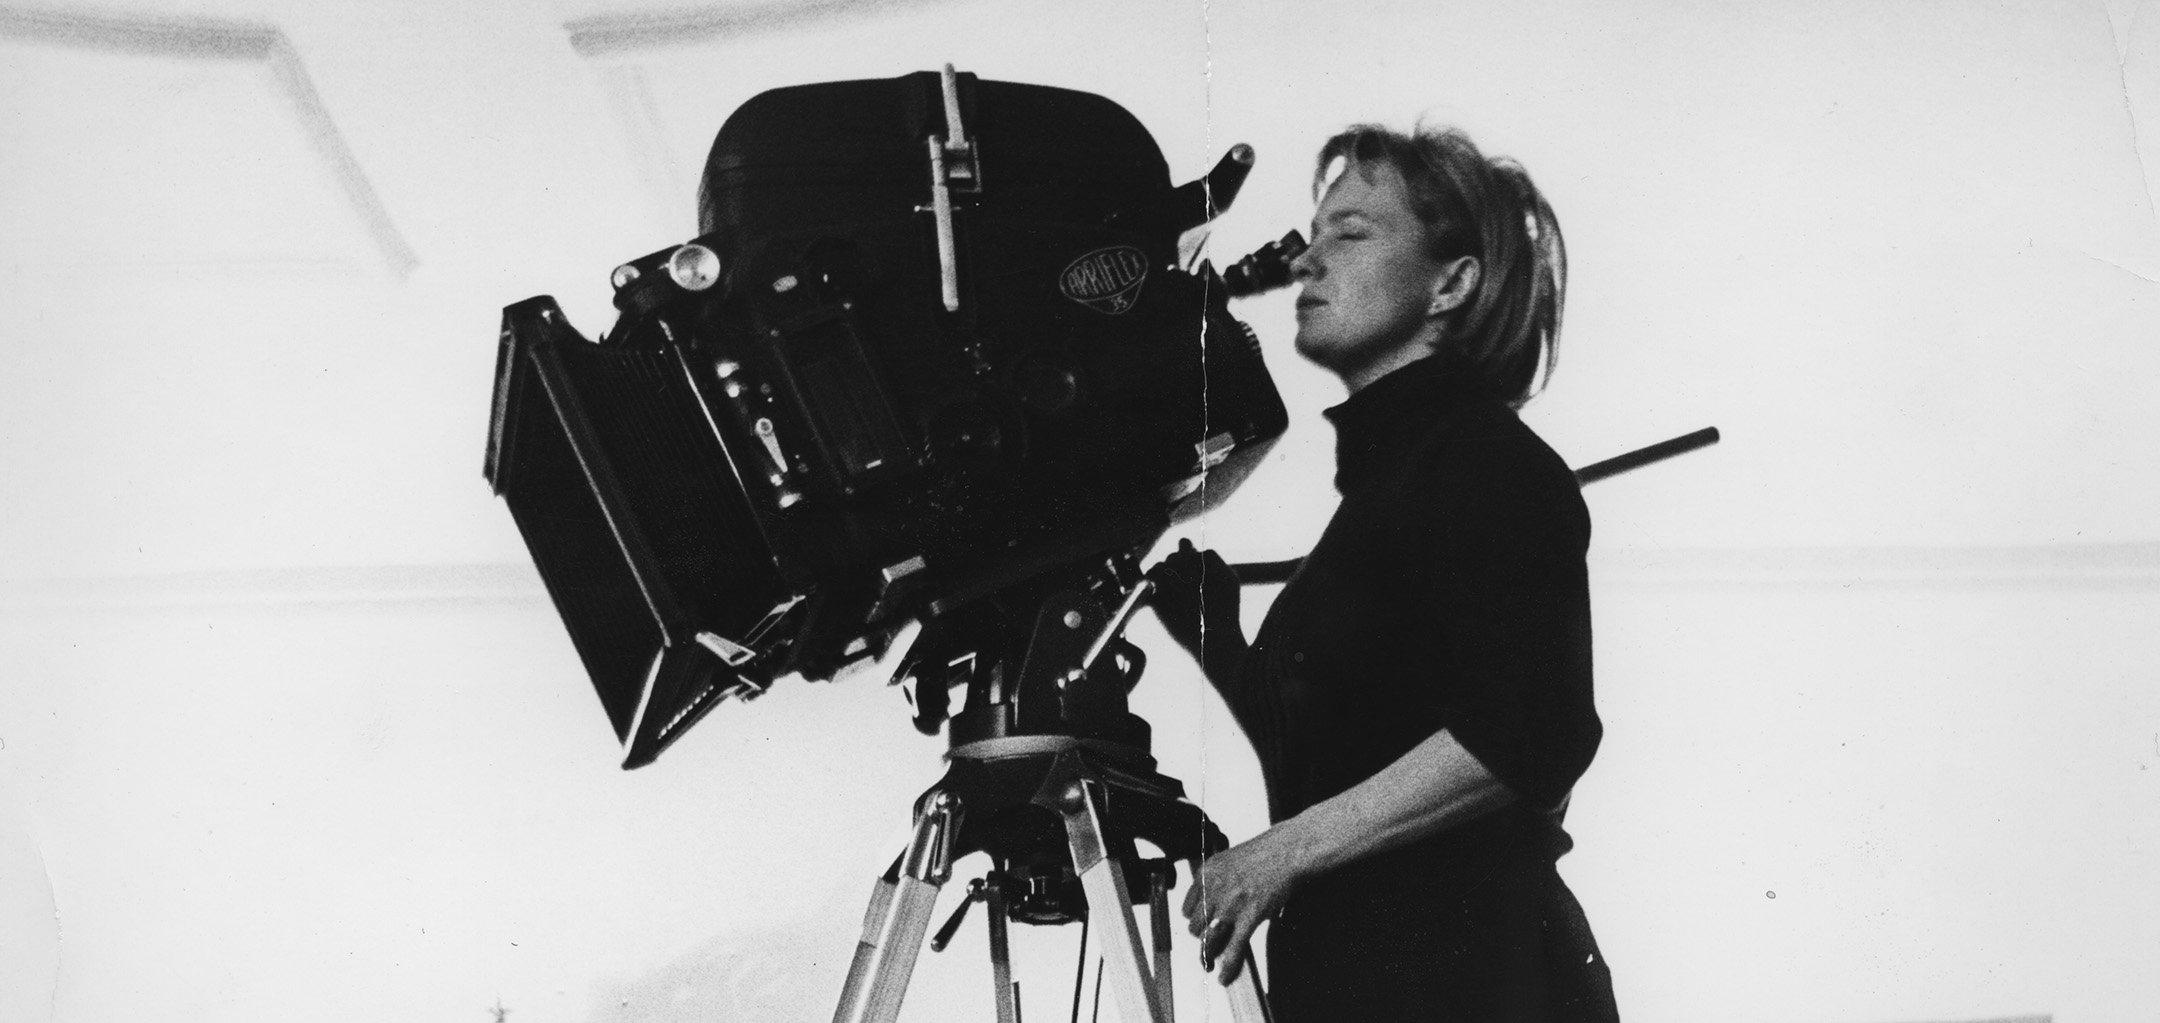 Mai Zetterling operating a camera